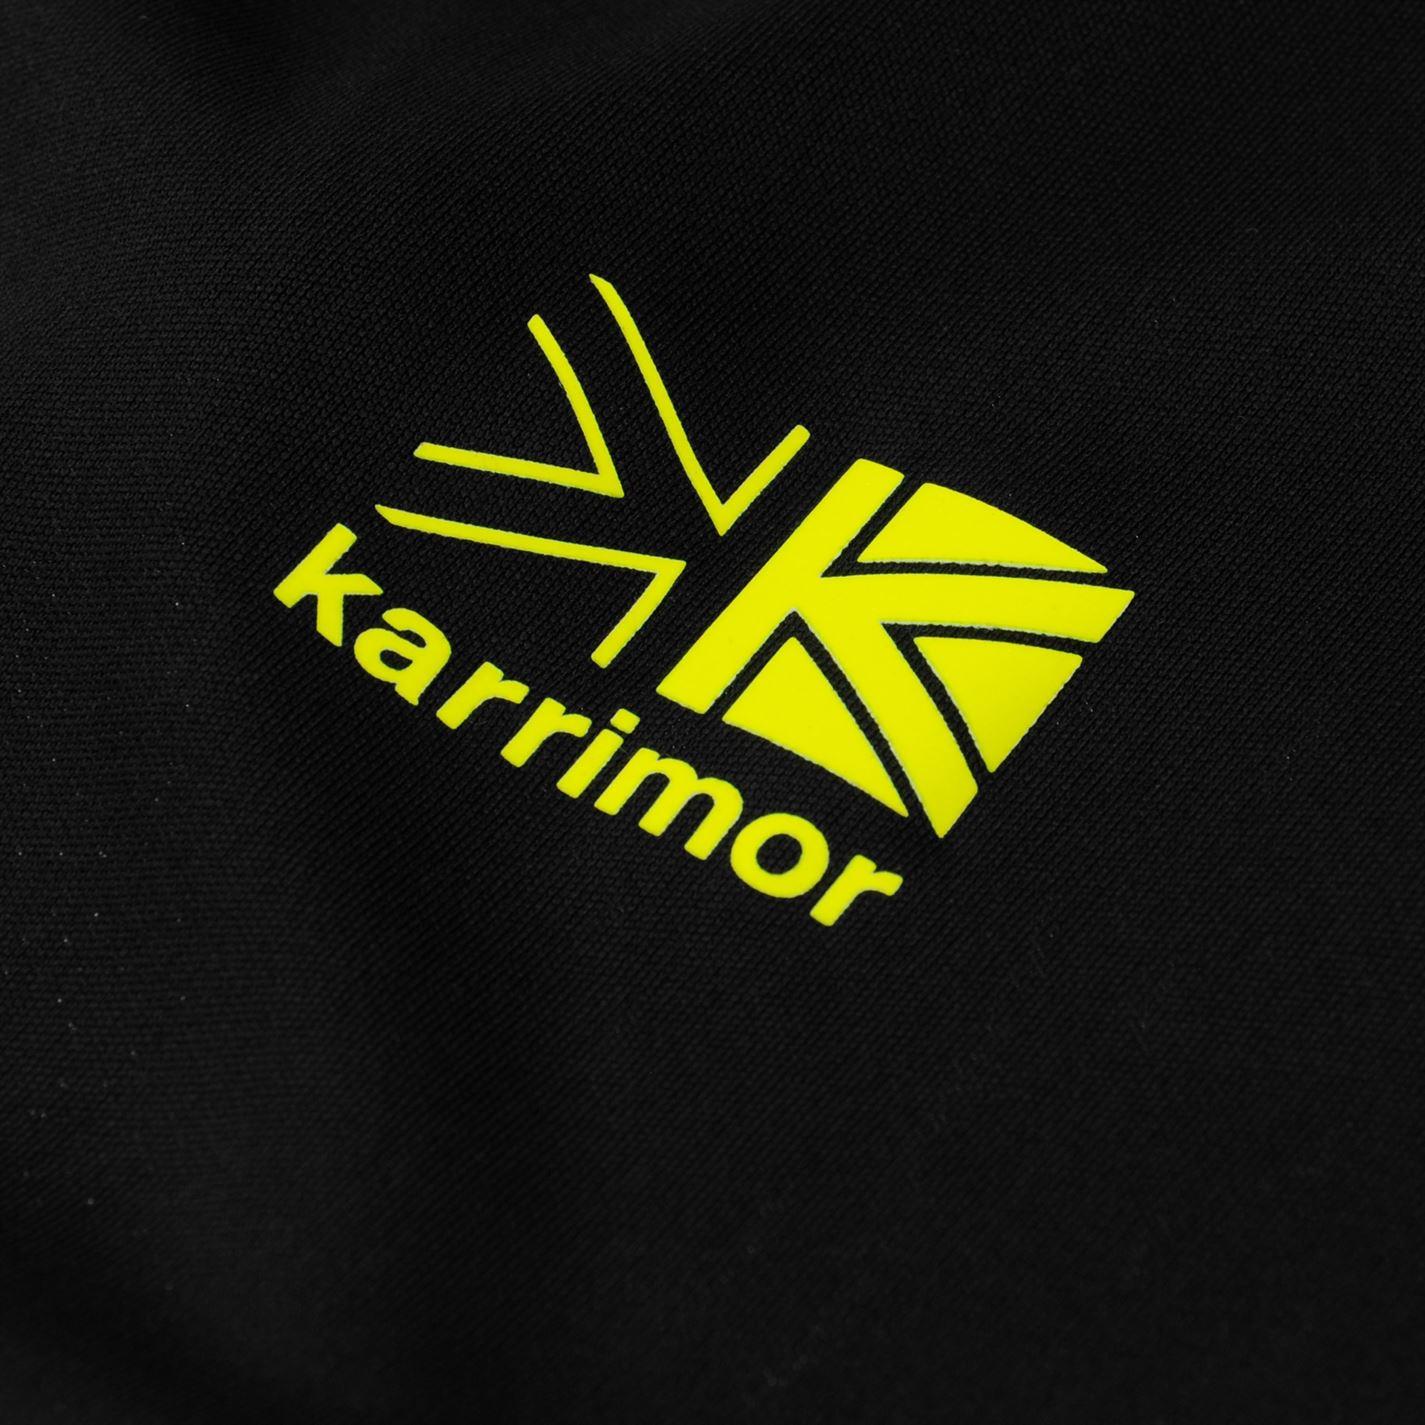 Karrimor-Hombres-X-Lite-Camiseta-mangas-cortas-de-carrera-Rendimiento-Camiseta-Top-Cuello-Redondo miniatura 15